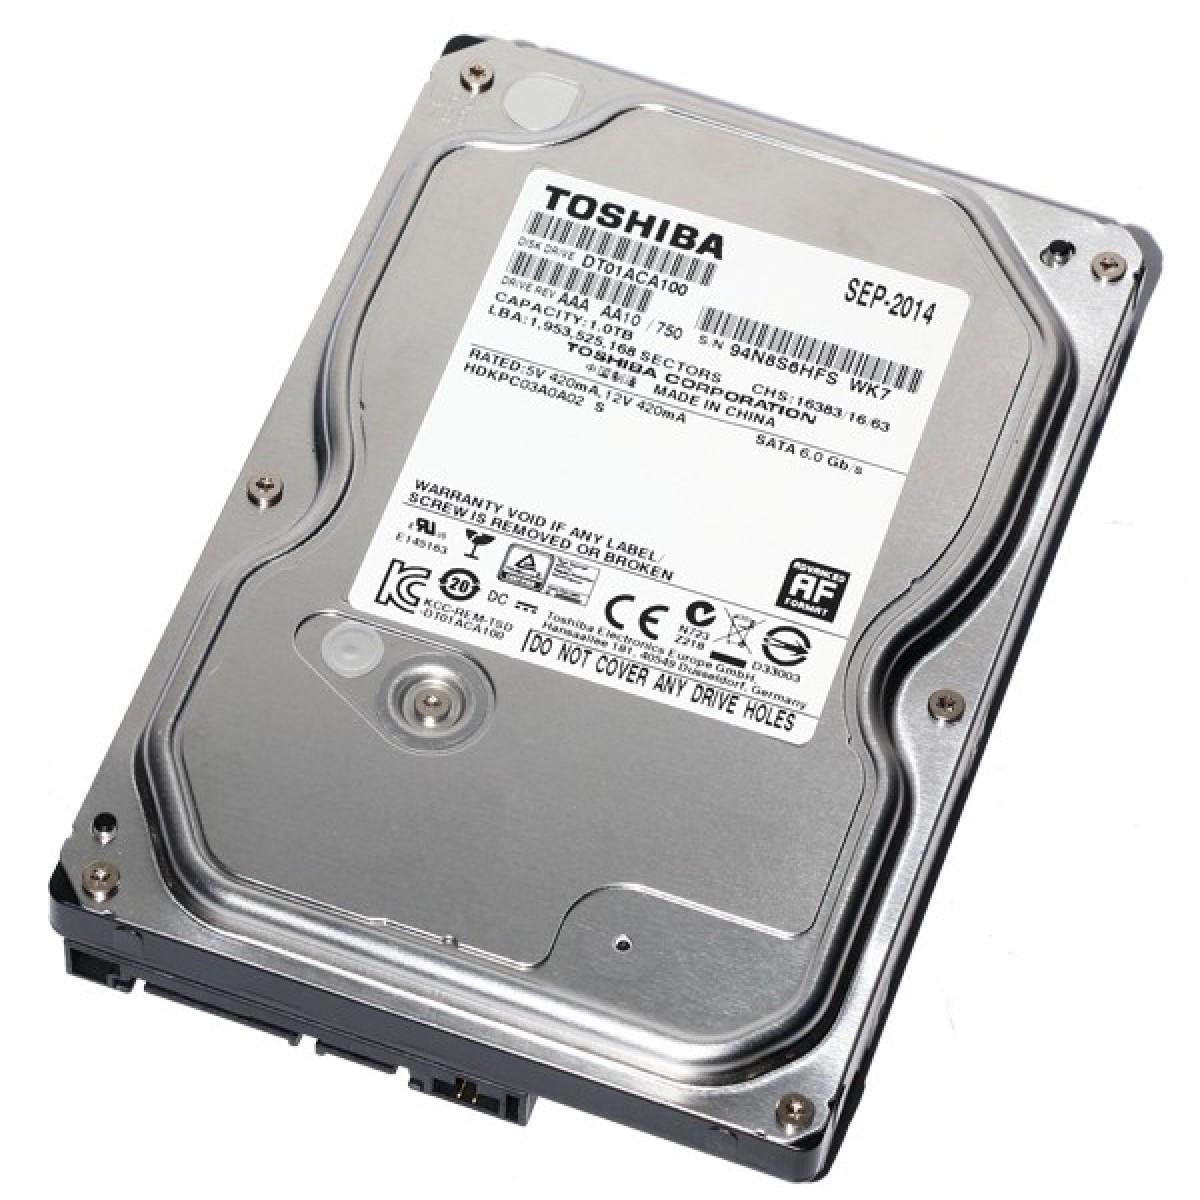 HD 1TB SATA3 DT01ACA100 7200RPM - TOSHIBA  - GAÚCHA DISTRIBUIDORA DE INFORMÁTICA